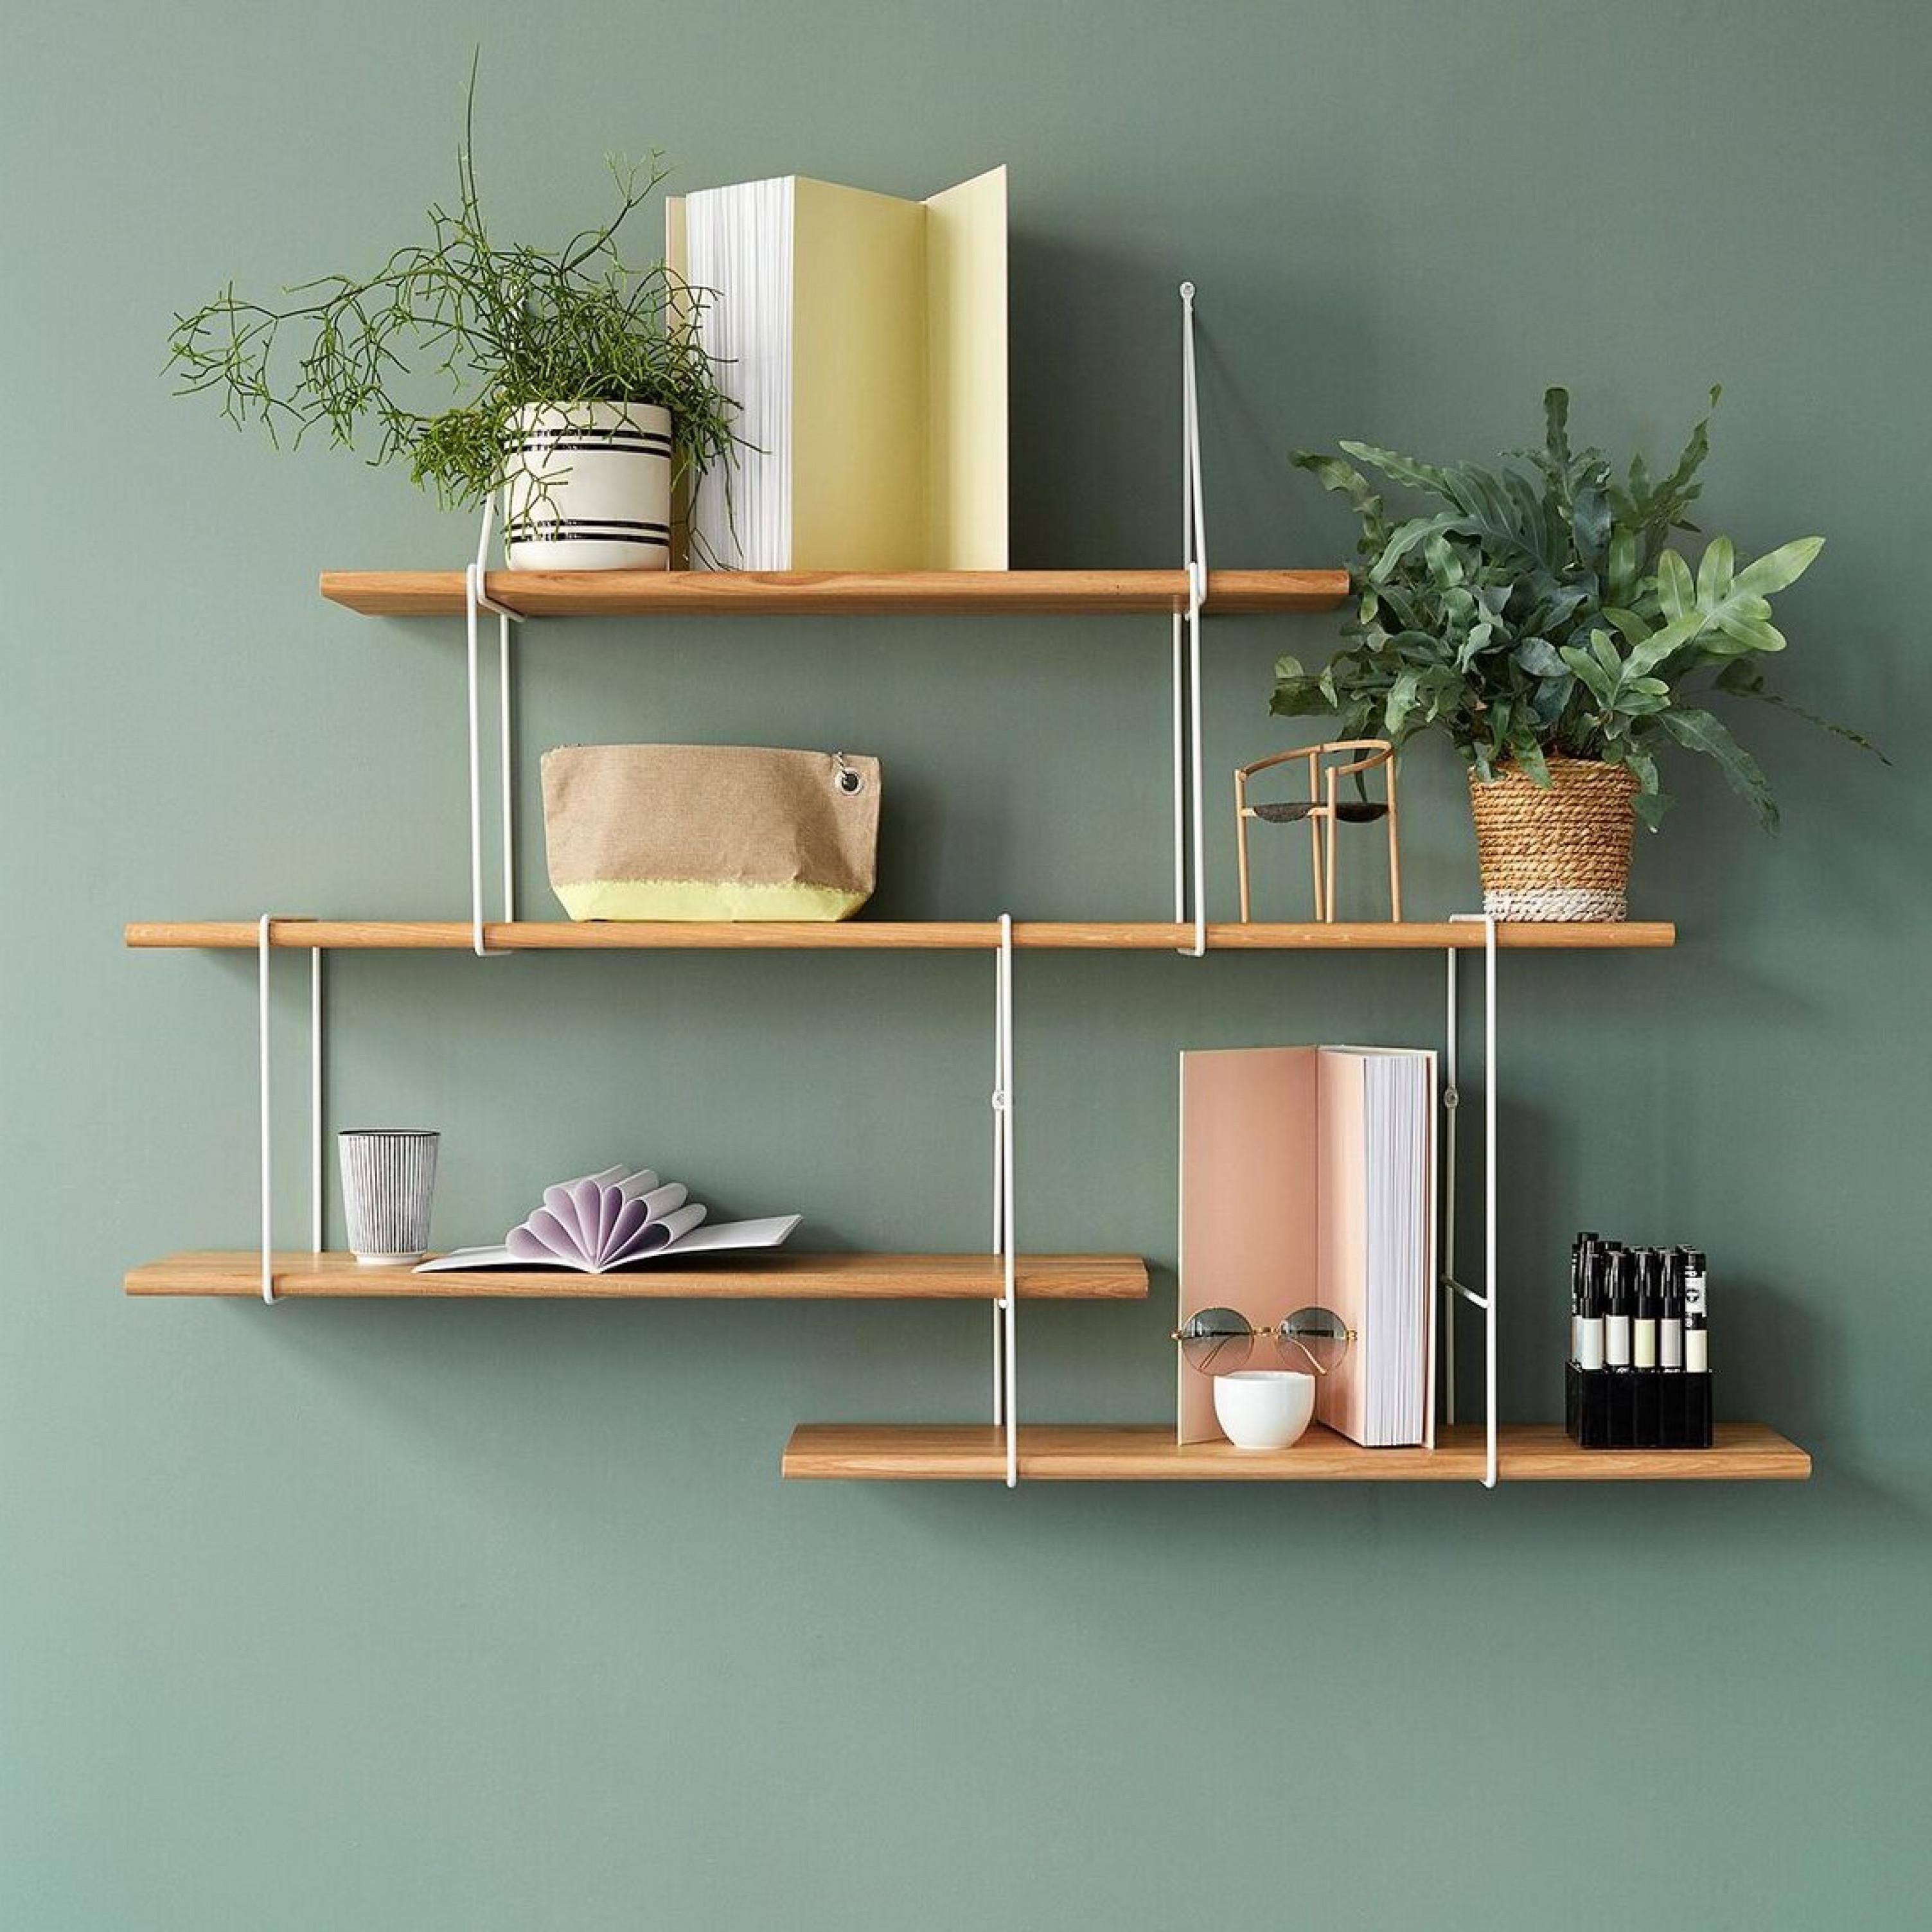 Shelving System LINK Set 2 | Oak White